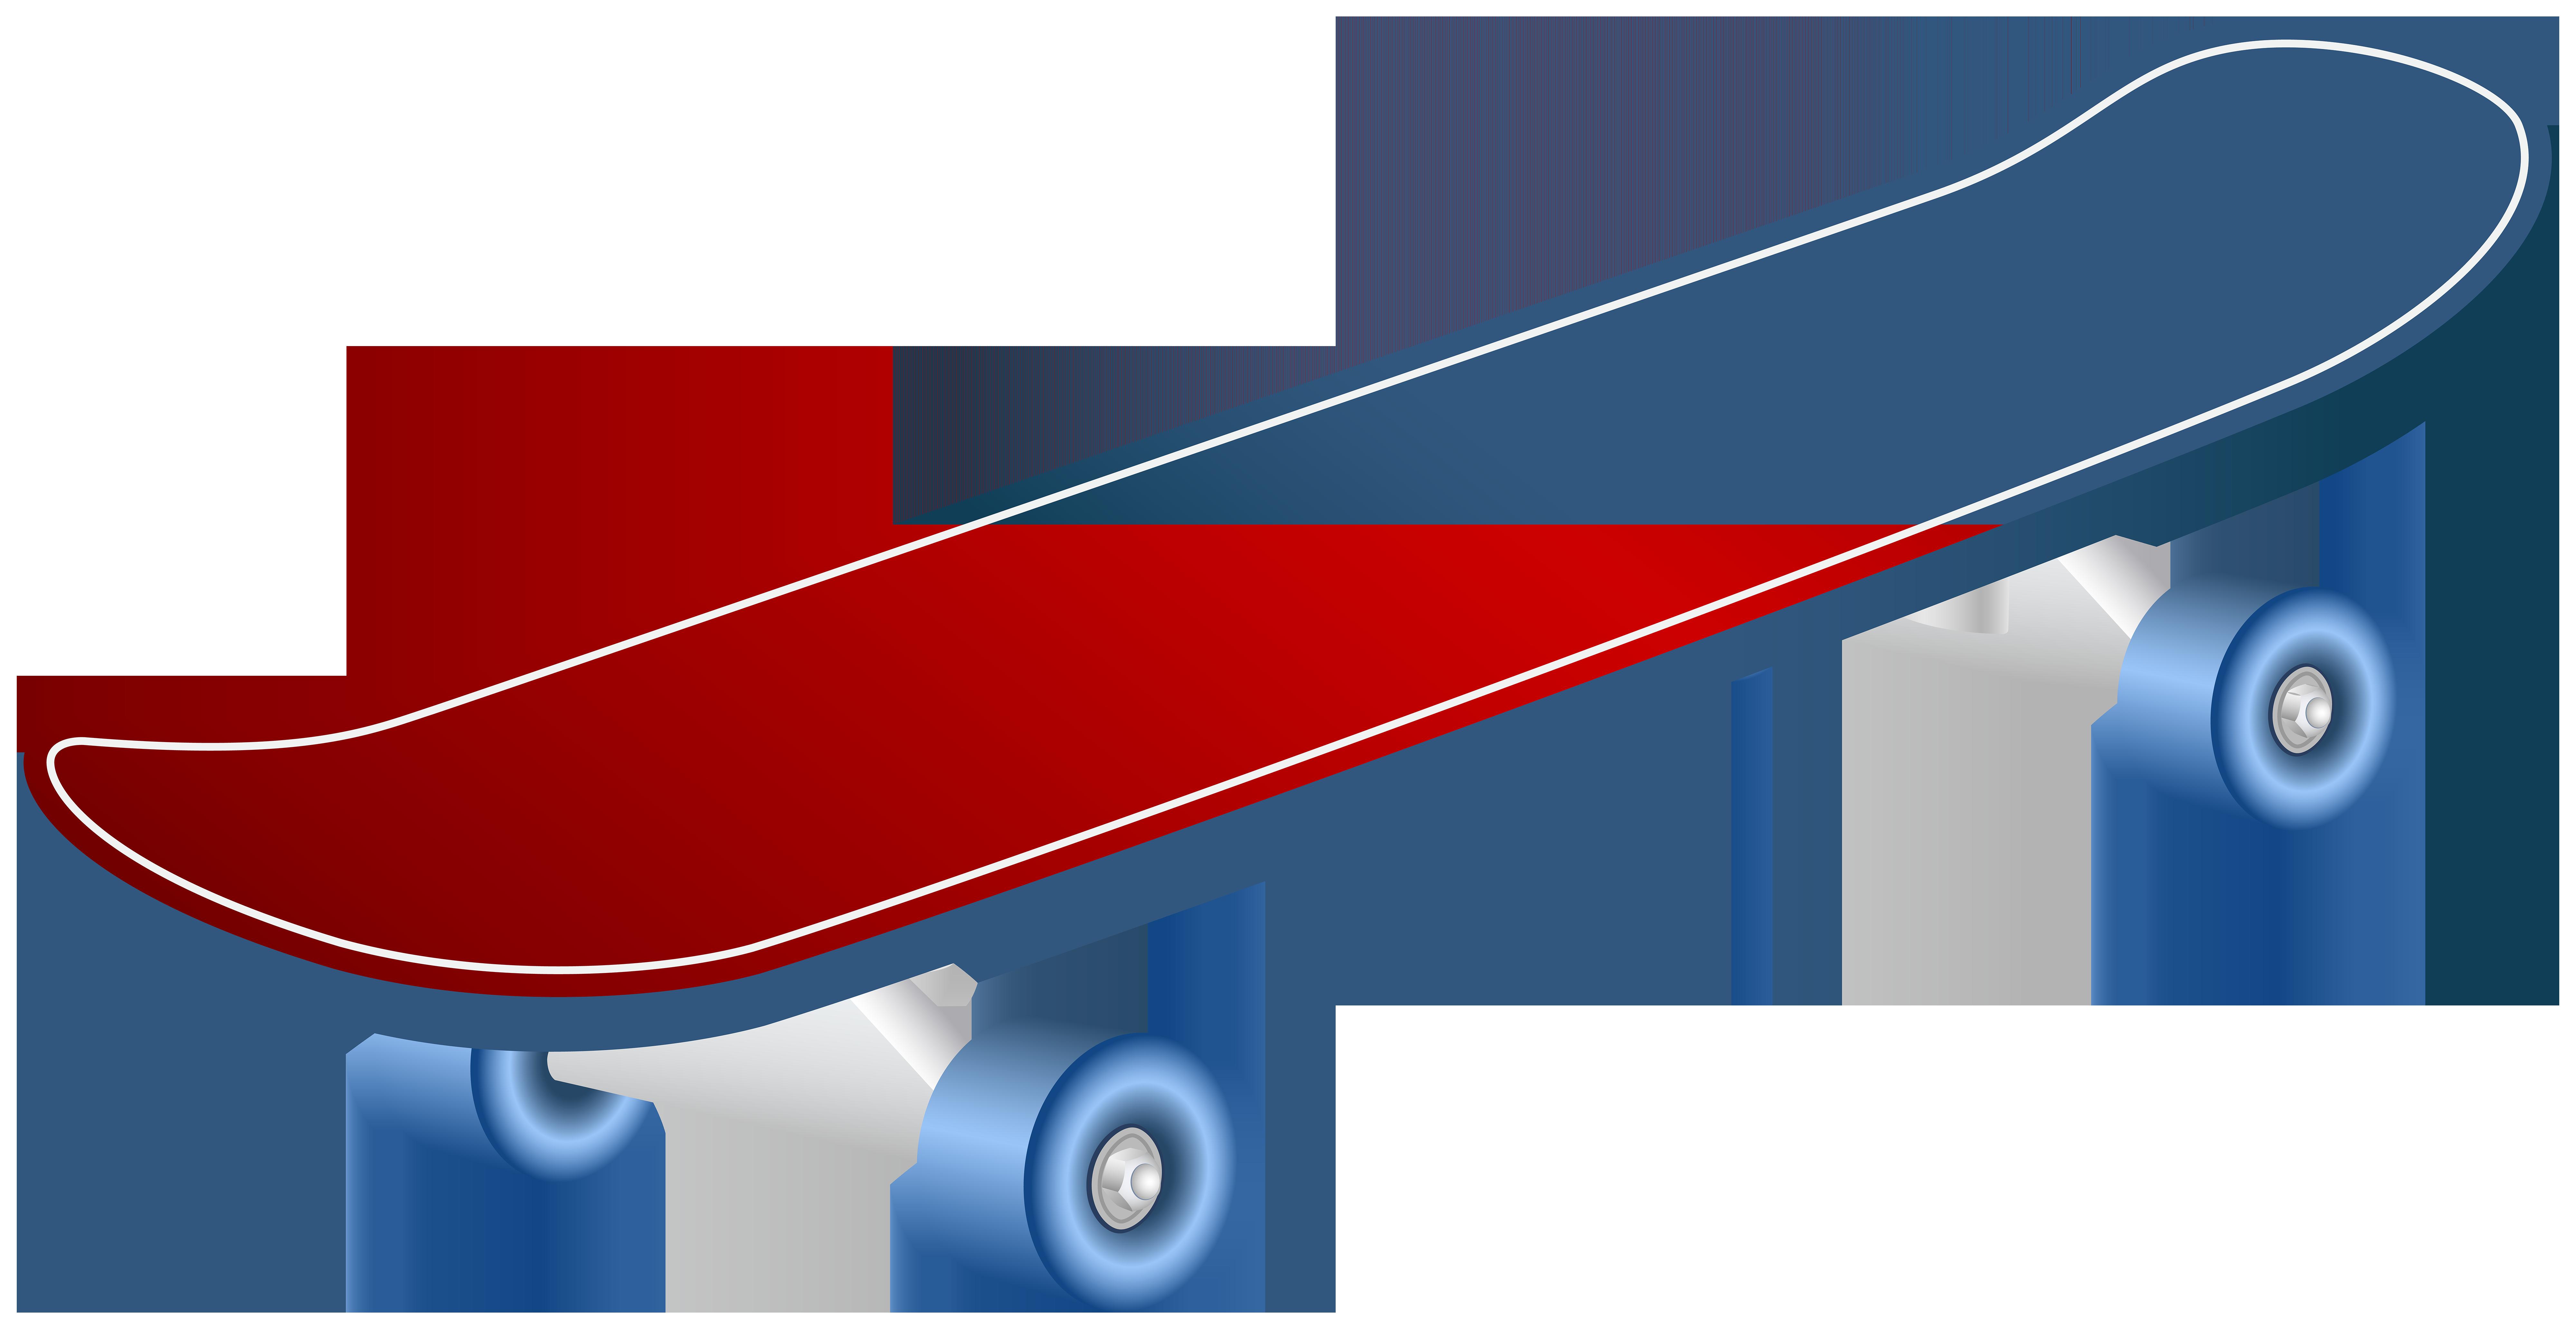 Skateboard Clip Art Image.